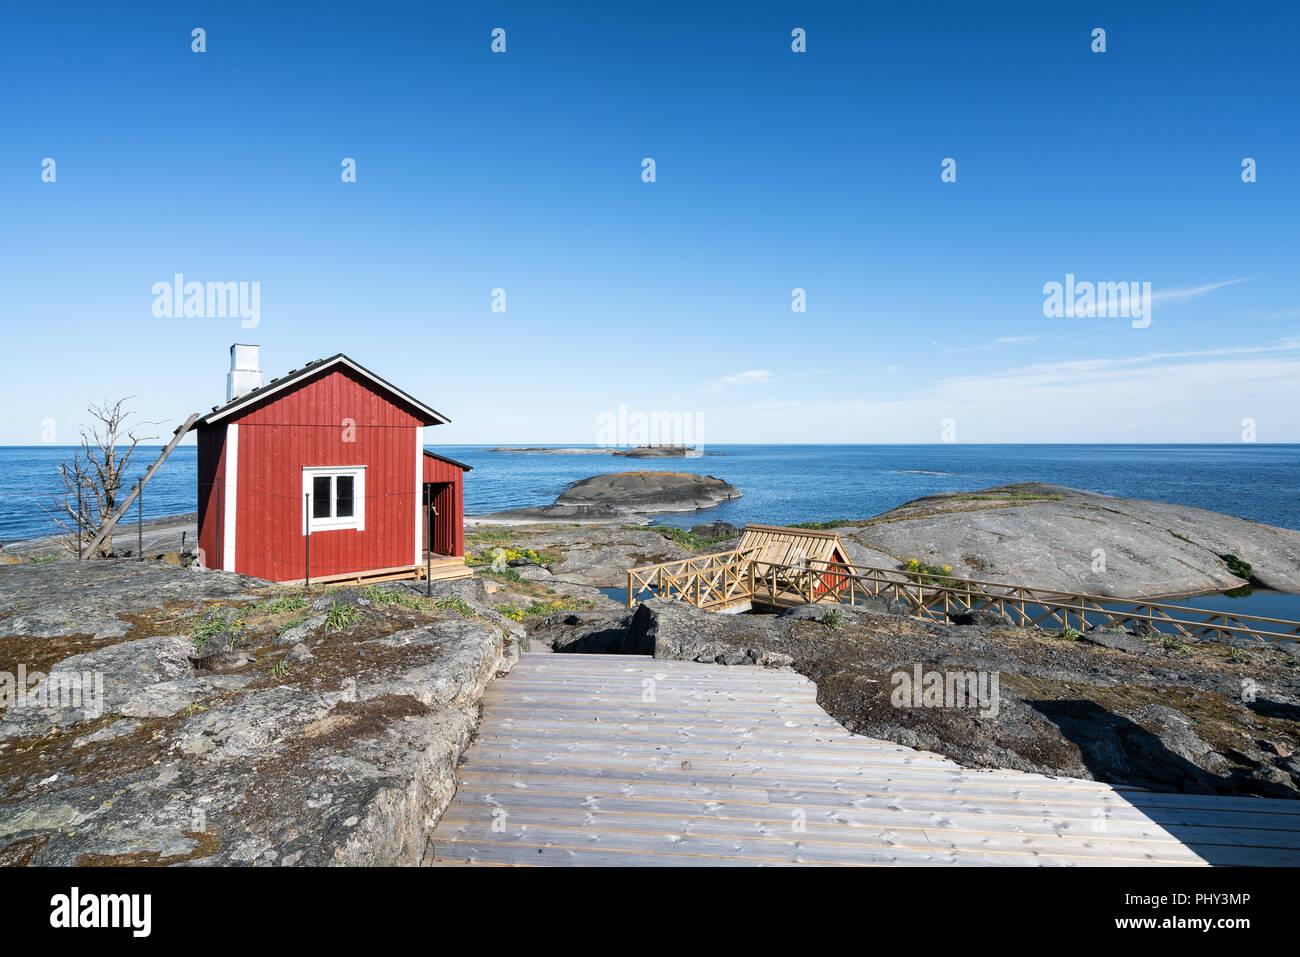 Sauna building at Söderskär lighthouse, Porvoo archipelago, Finland, Europe - Stock Image